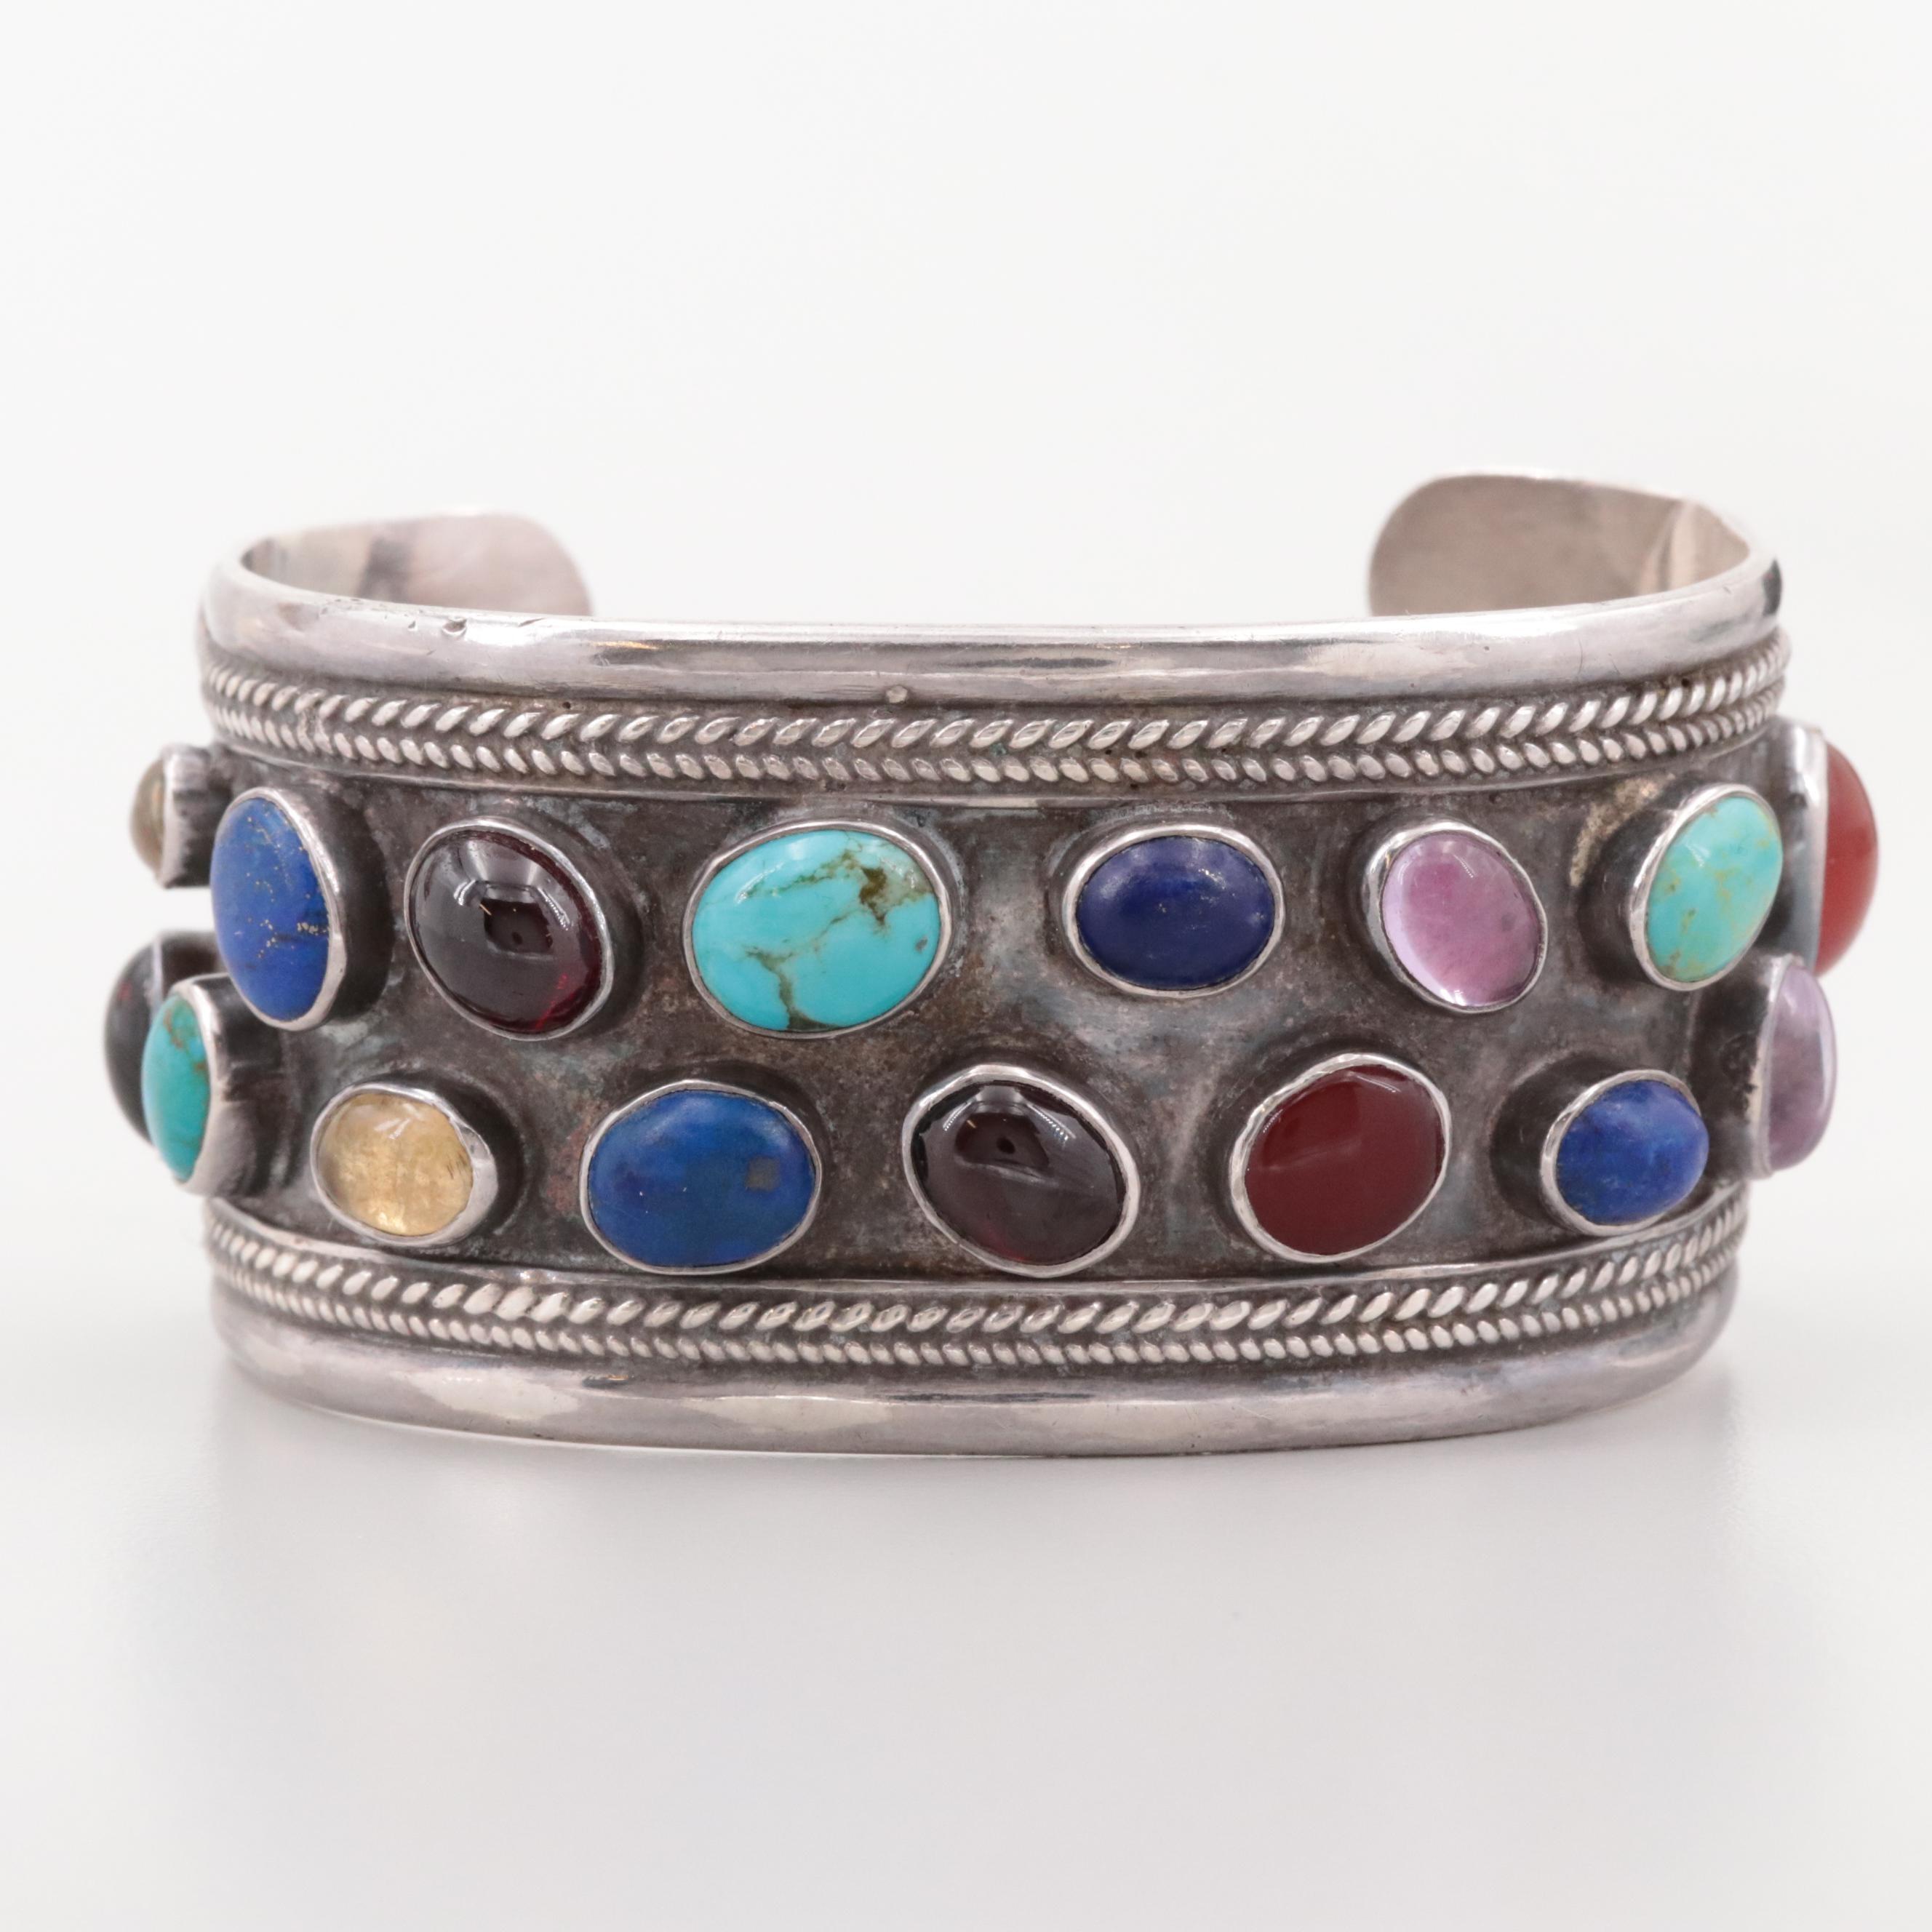 Southwestern Style Sterling Garnet, Turquoise and Lapis Lazuli Cuff Bracelet